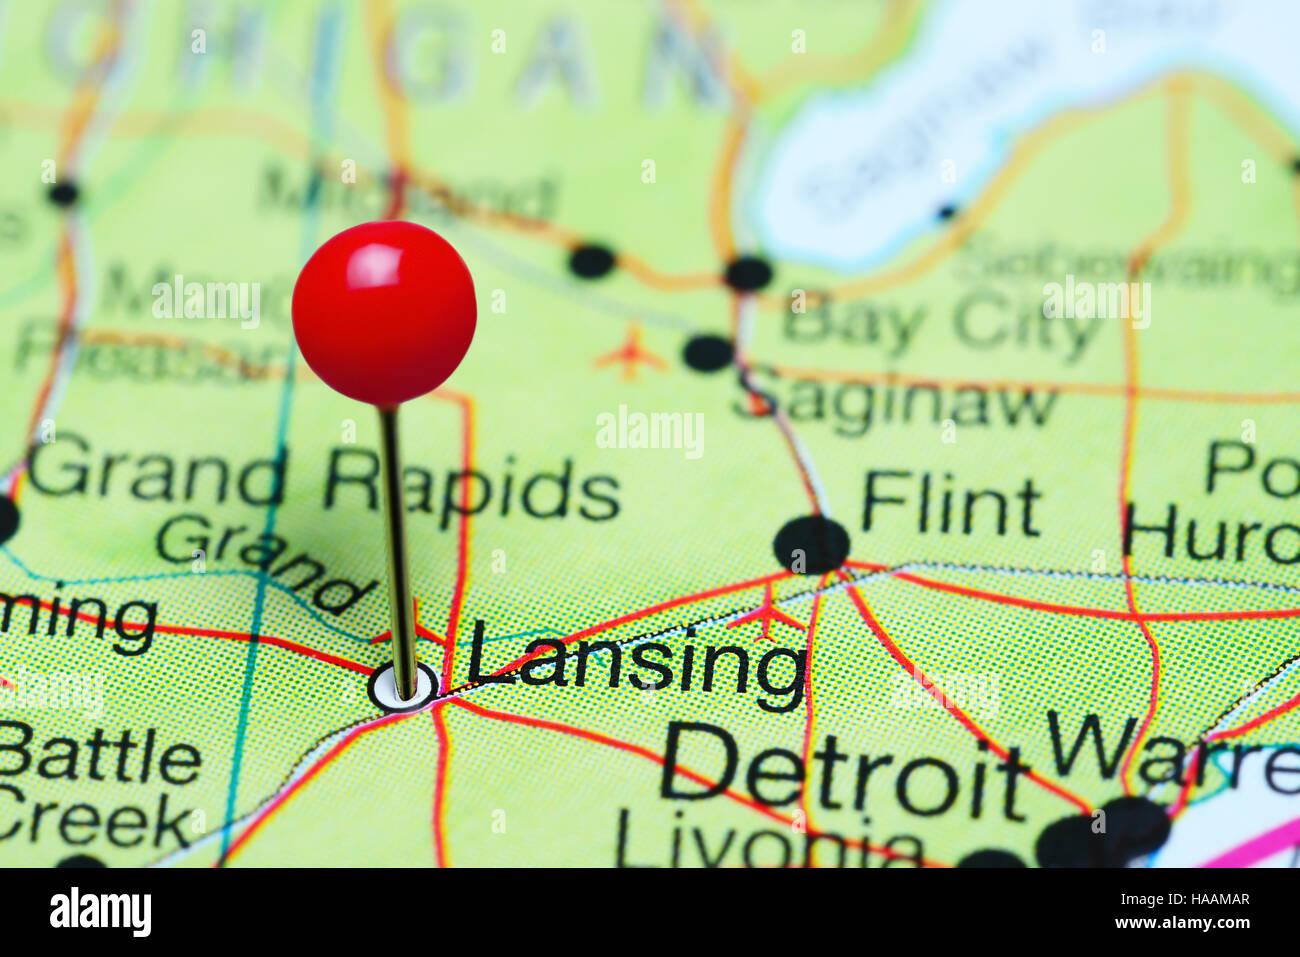 Lansing pinned on a map of Michigan, USA Stock Photo ...